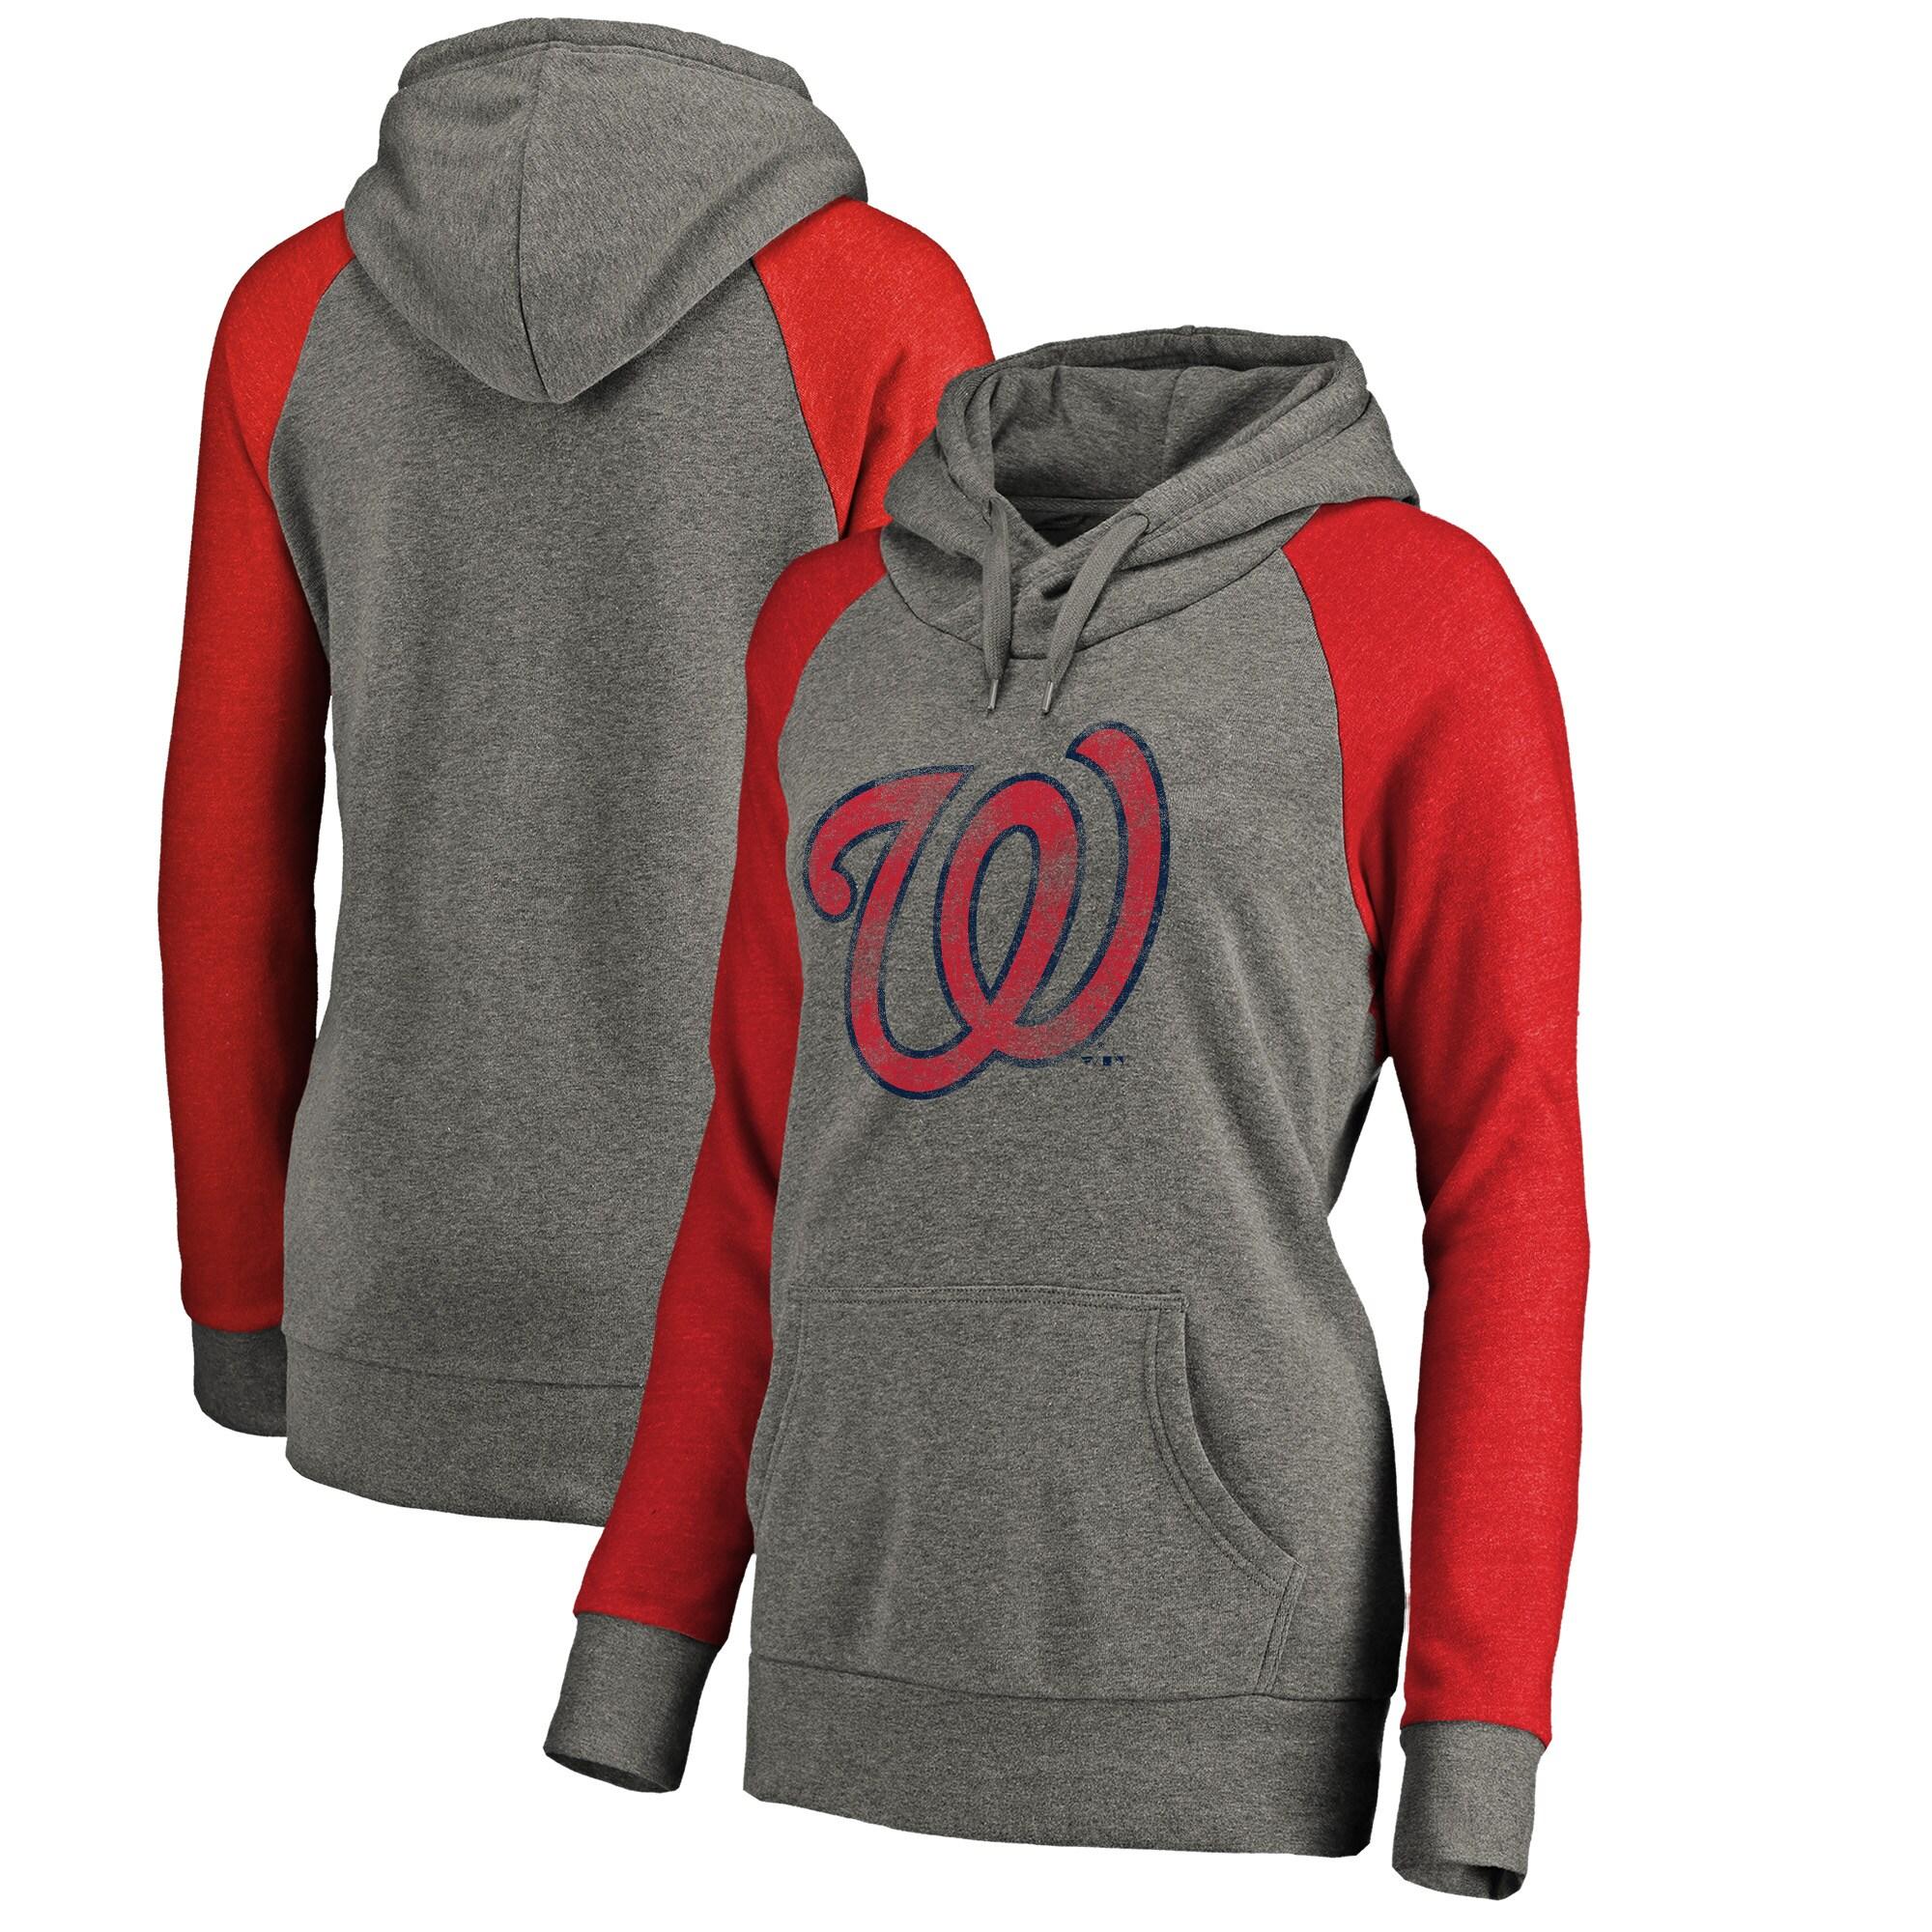 Washington Nationals Fanatics Branded Women's Distressed Team Logo Tri-Blend Raglan Pullover Hoodie - Gray/Red